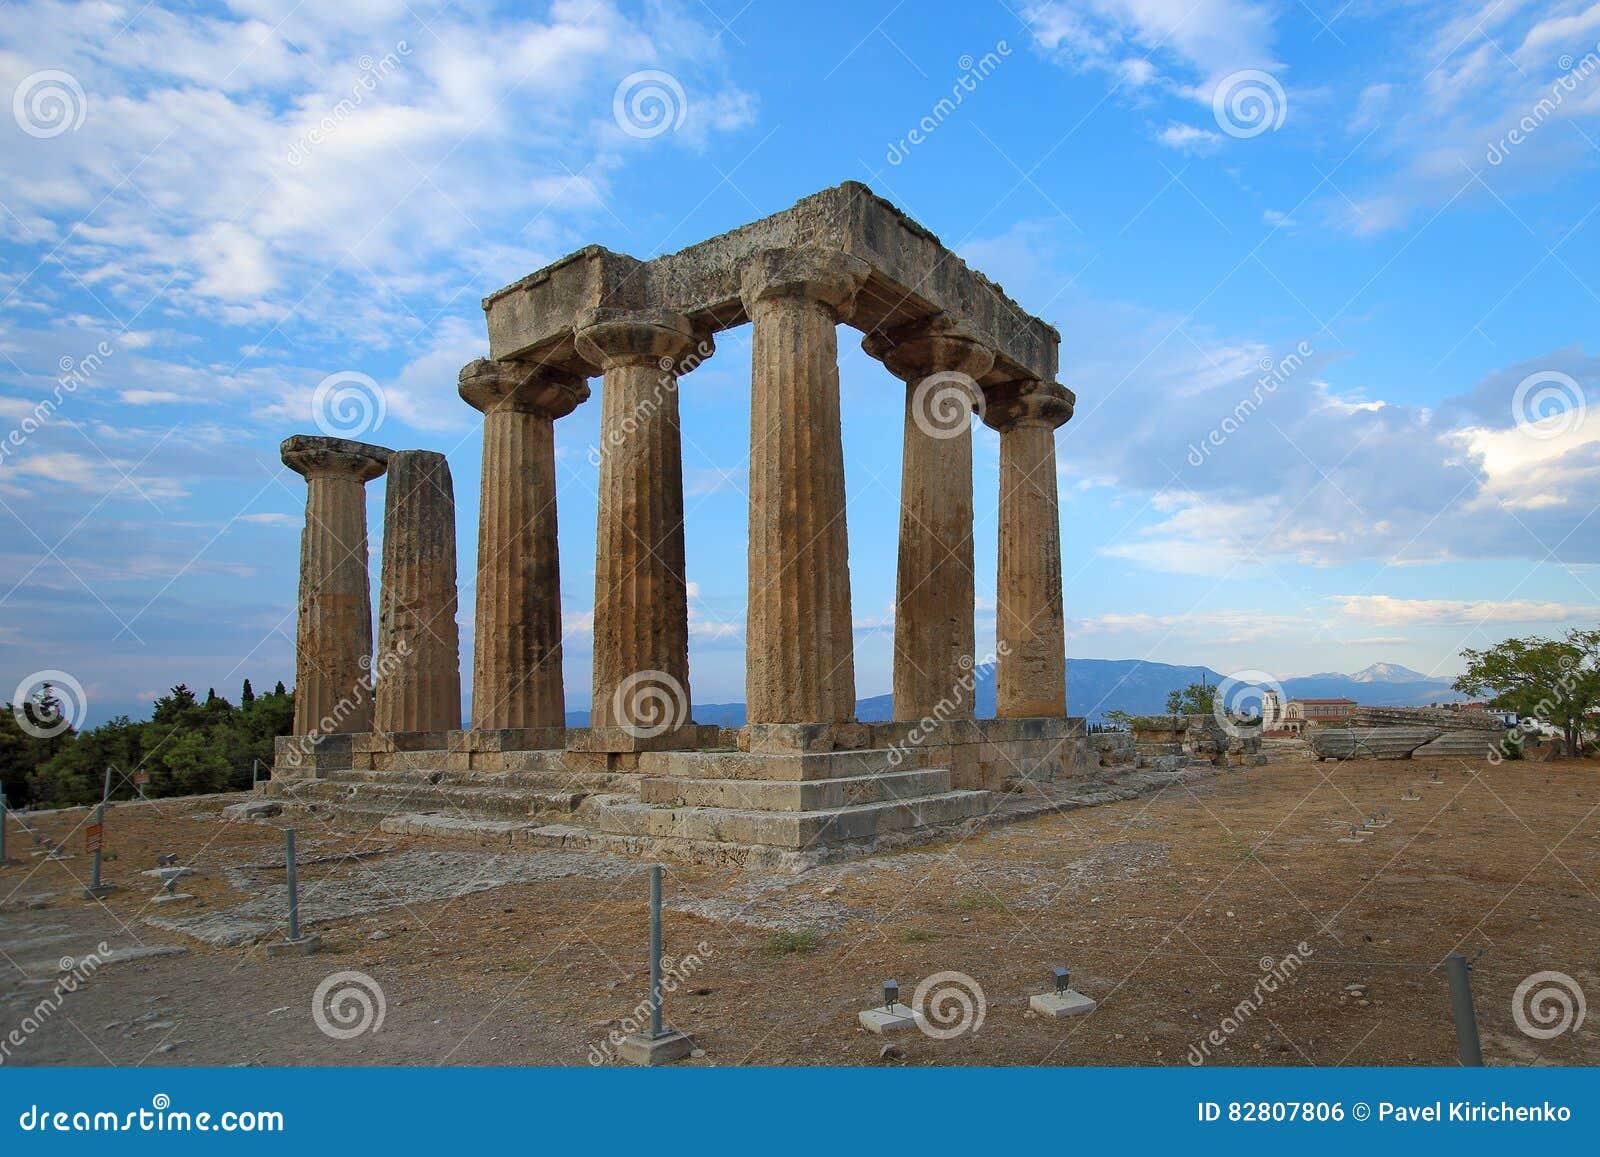 Ruins of Apollo temple of ancient Corinth, Greece